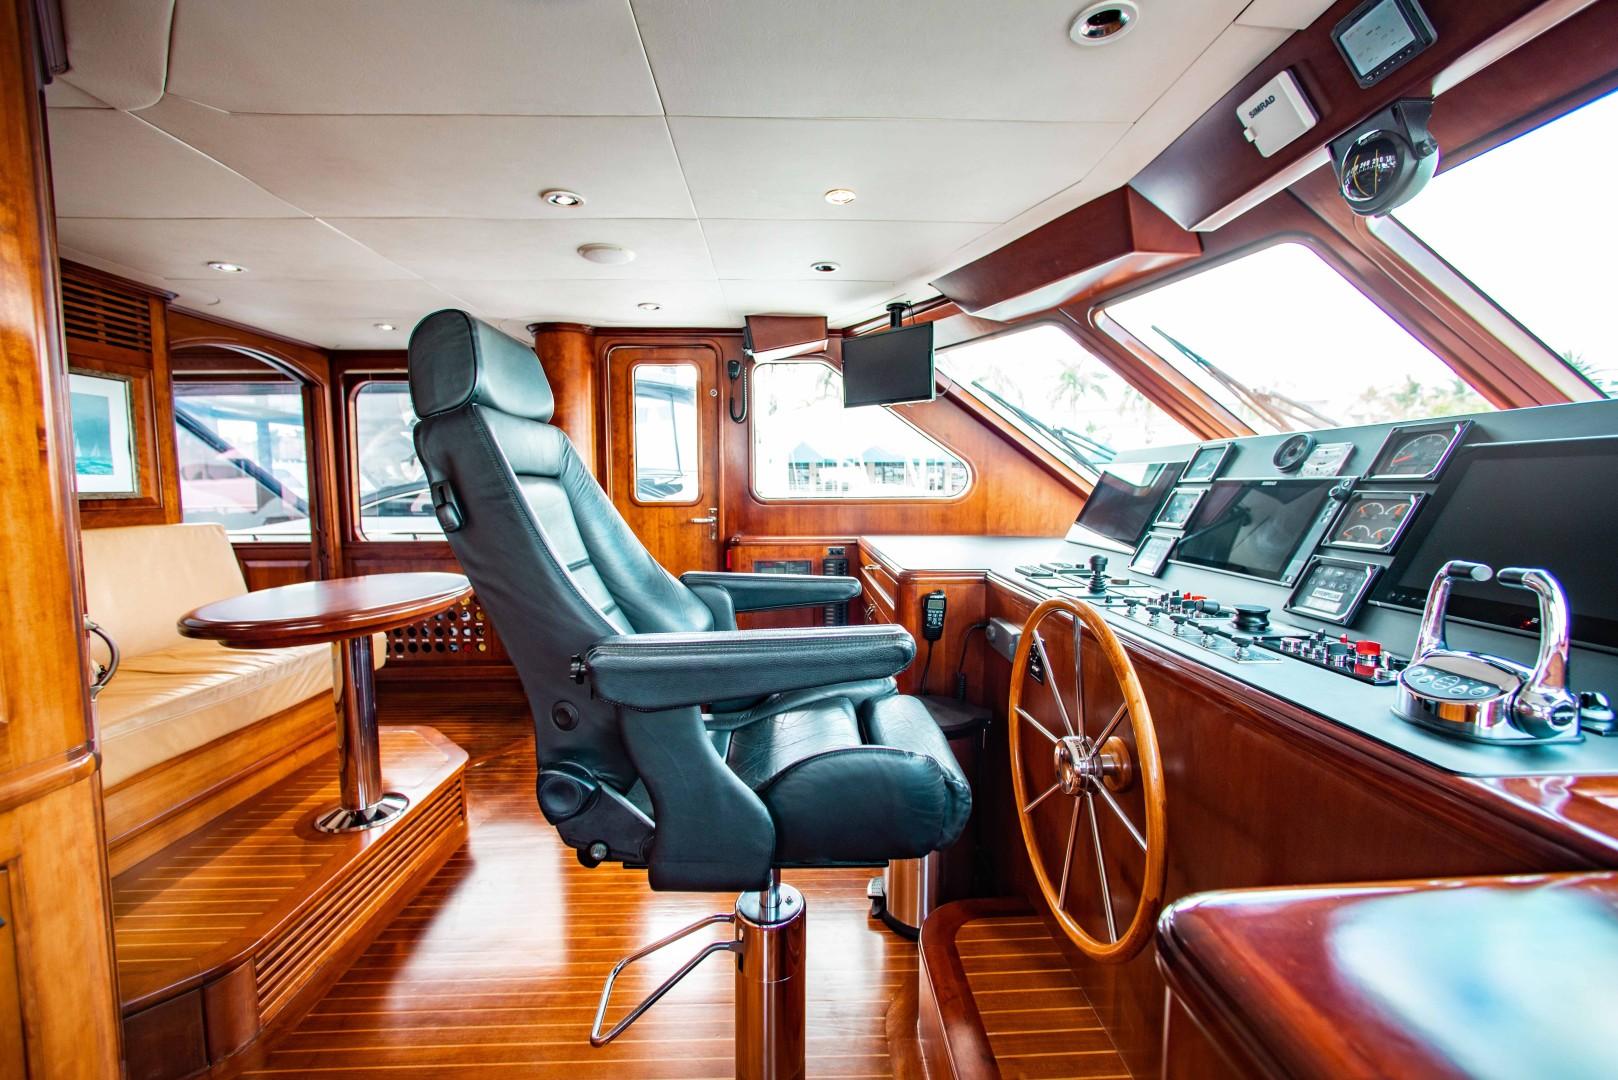 Conrad Shipyard-88 Motor Yacht 2005-Chillin Fort Lauderdale-Florida-United States-2000 Conrad Shipyard 88 Motor Yacht Chillin-1642473   Thumbnail